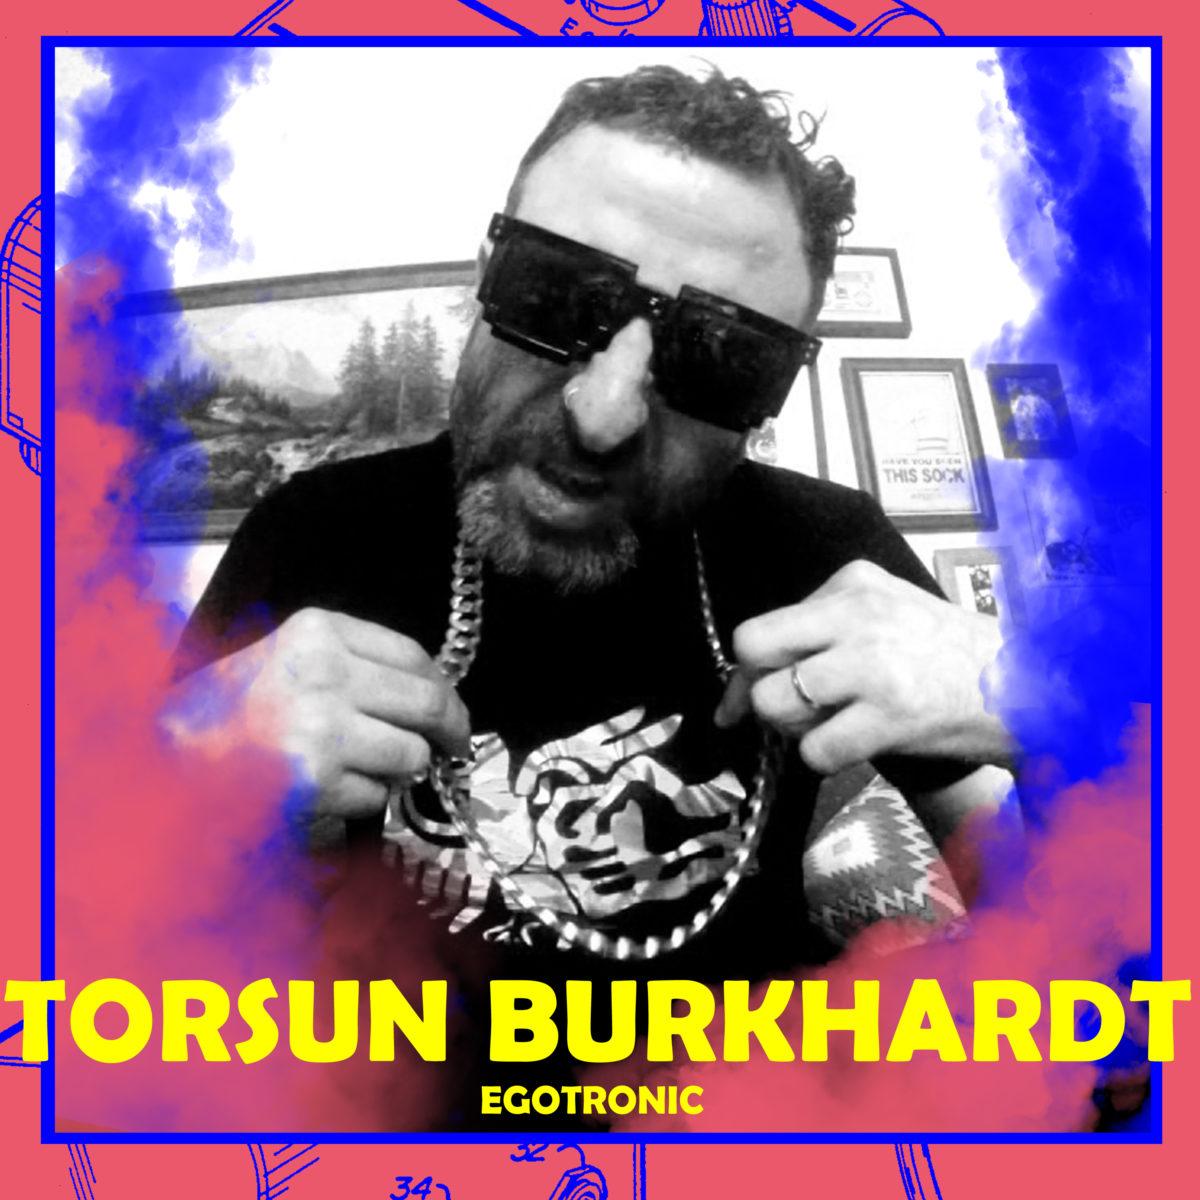 Torsun (Egotronic)